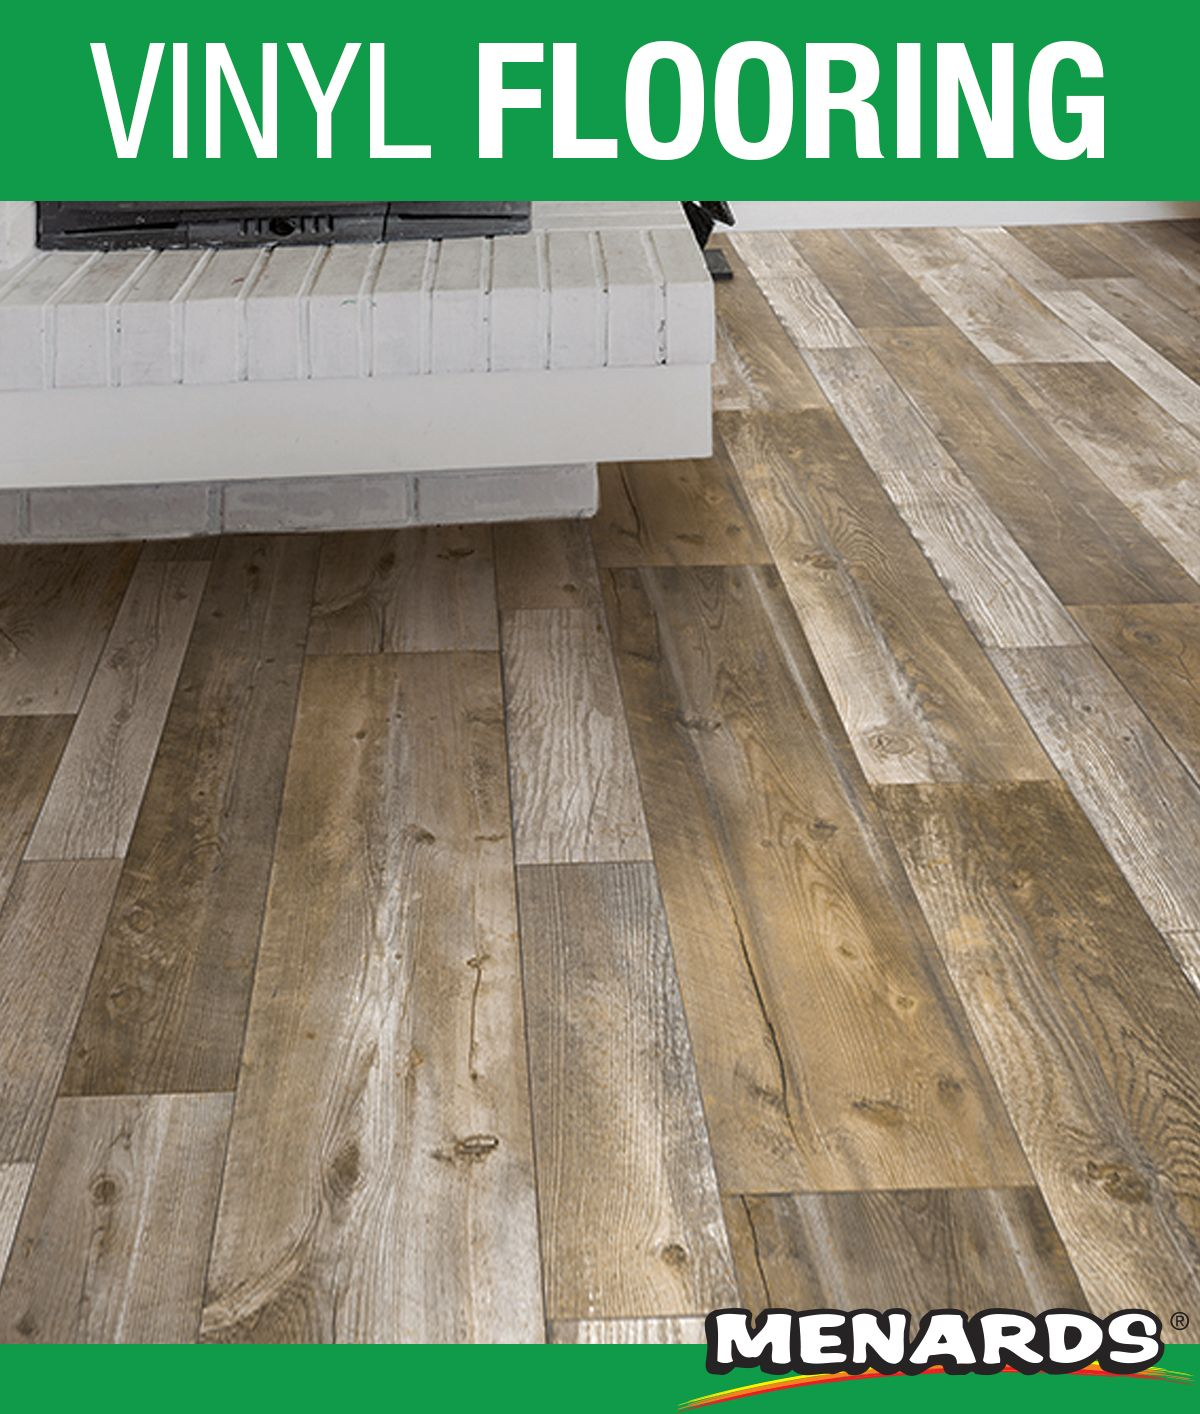 Tarkett Vibe Is A Revolutionary Sheet Vinyl Flooring Product That Offers Unique Performance Benefits Such As Extra Vinyl Flooring Flooring Vinyl Sheet Flooring